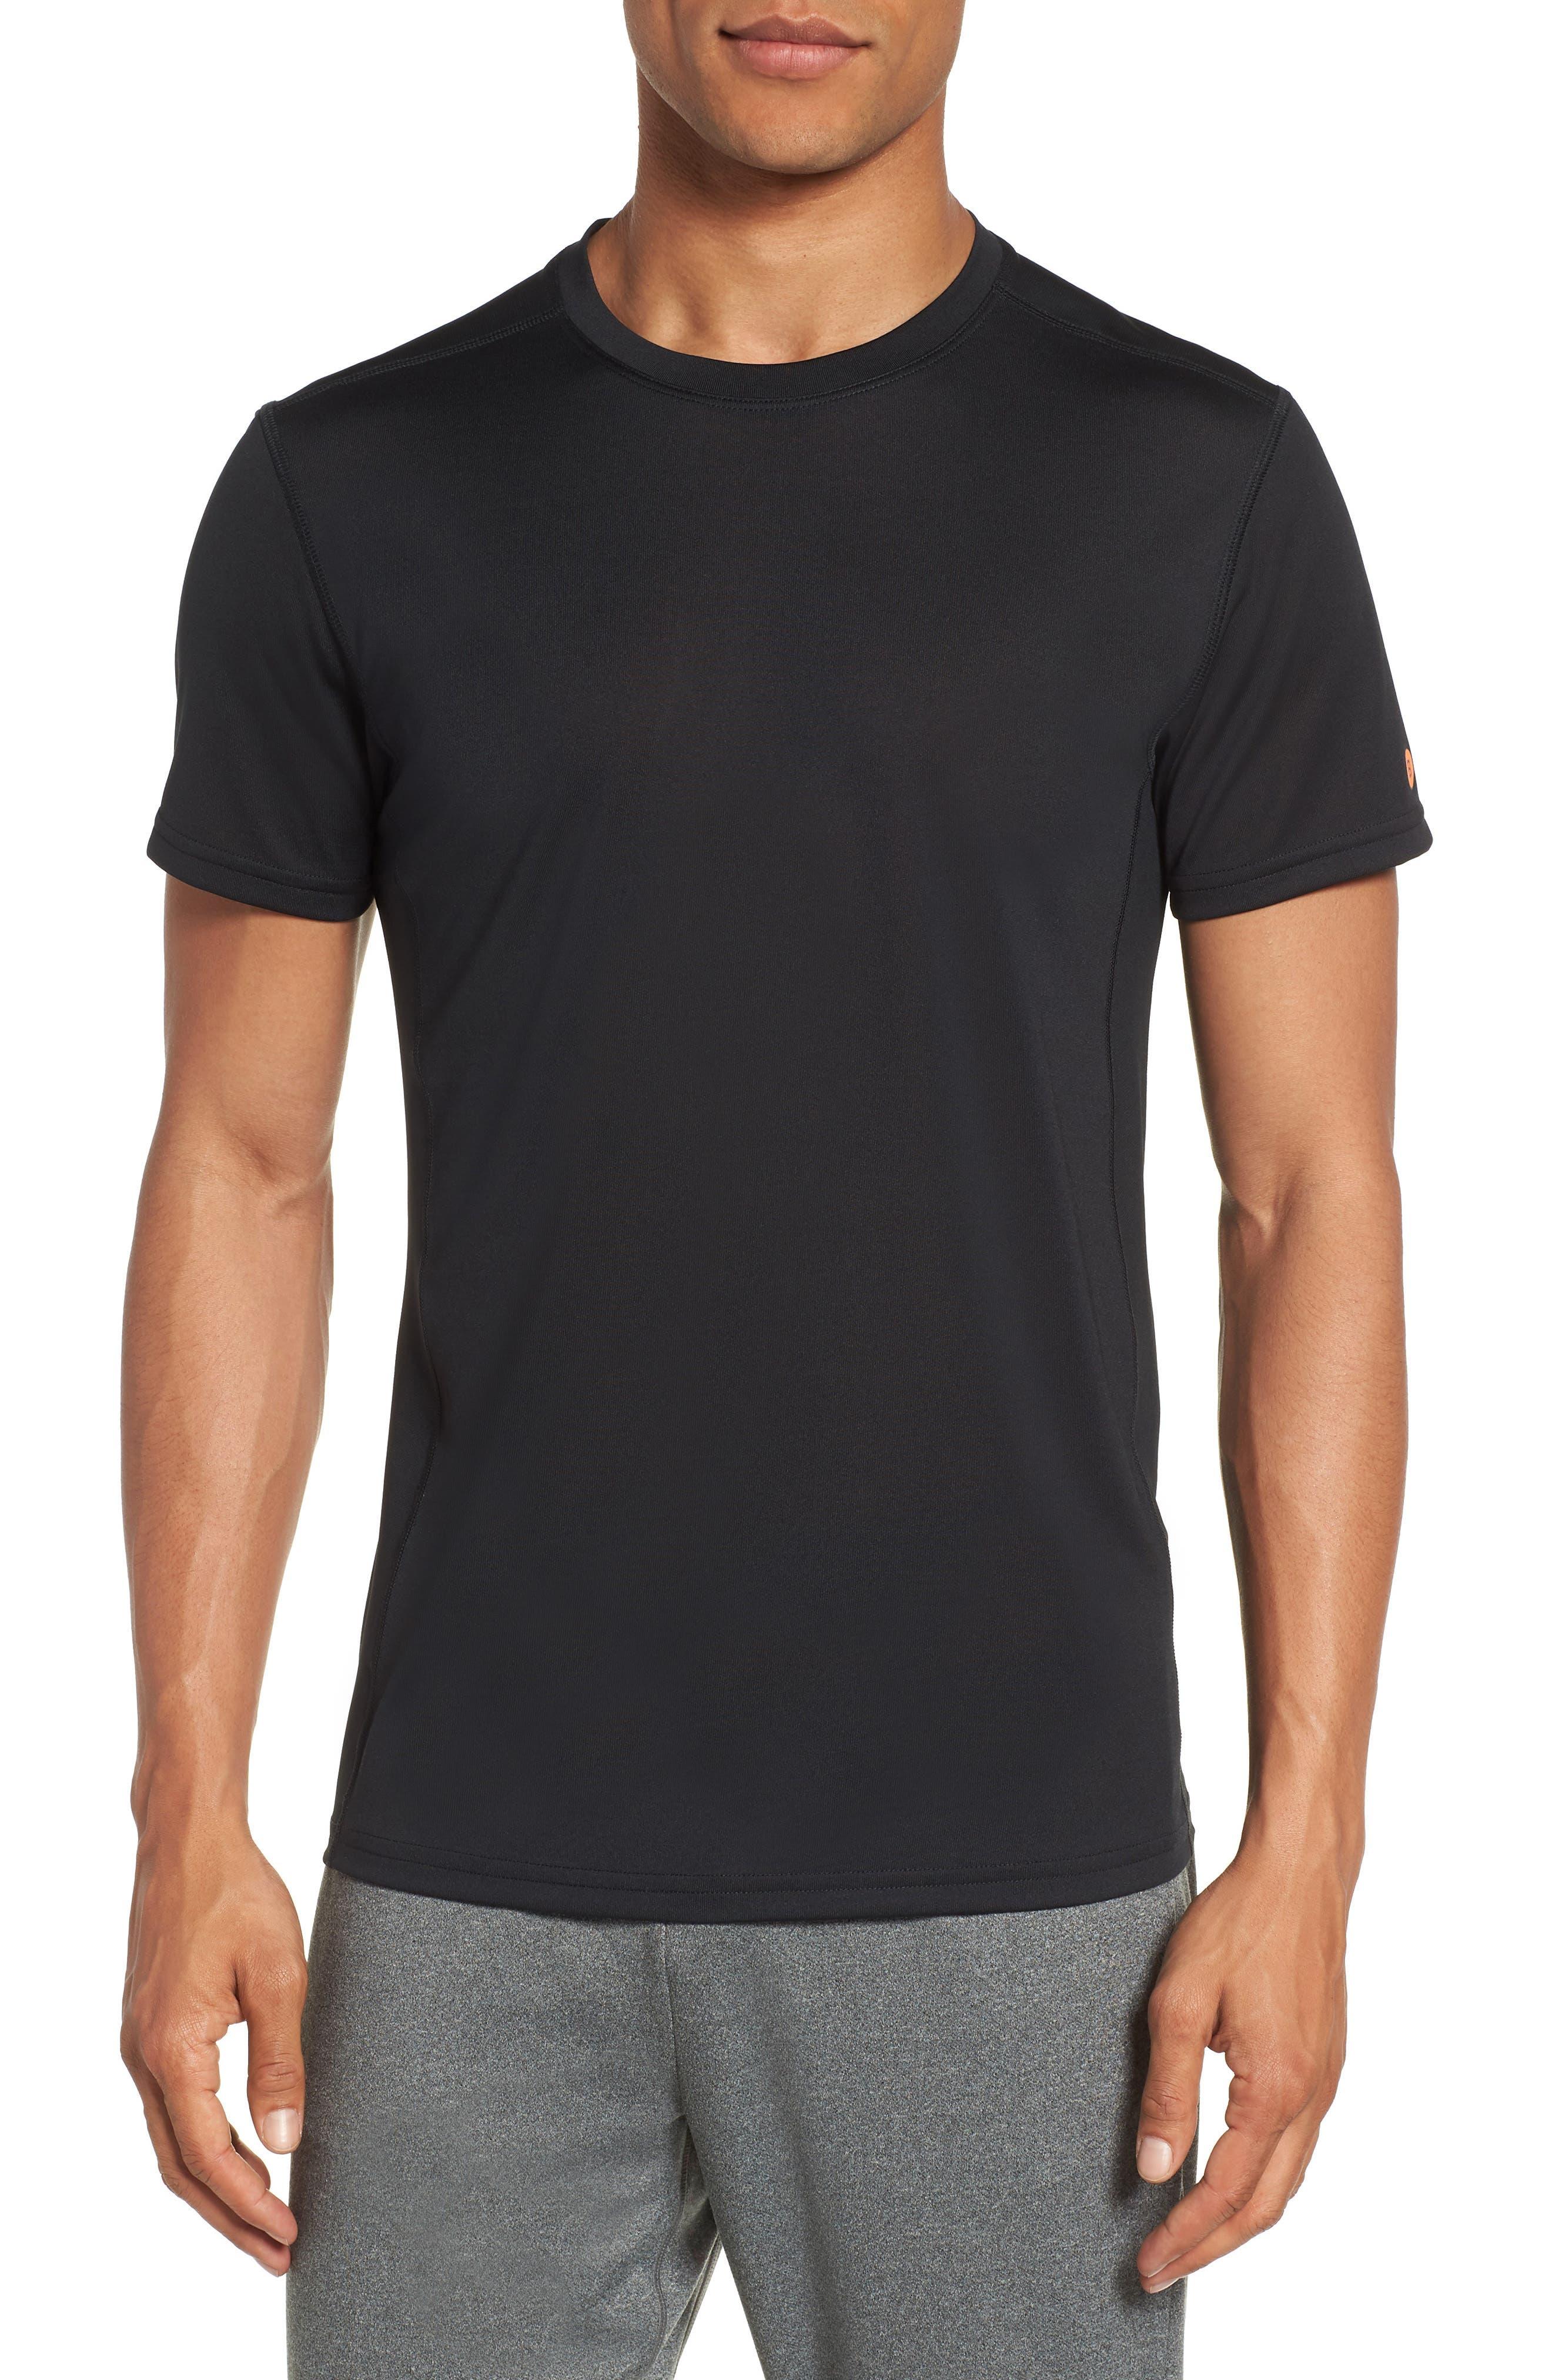 Goodsport Mesh Panel T-Shirt,                             Main thumbnail 1, color,                             001